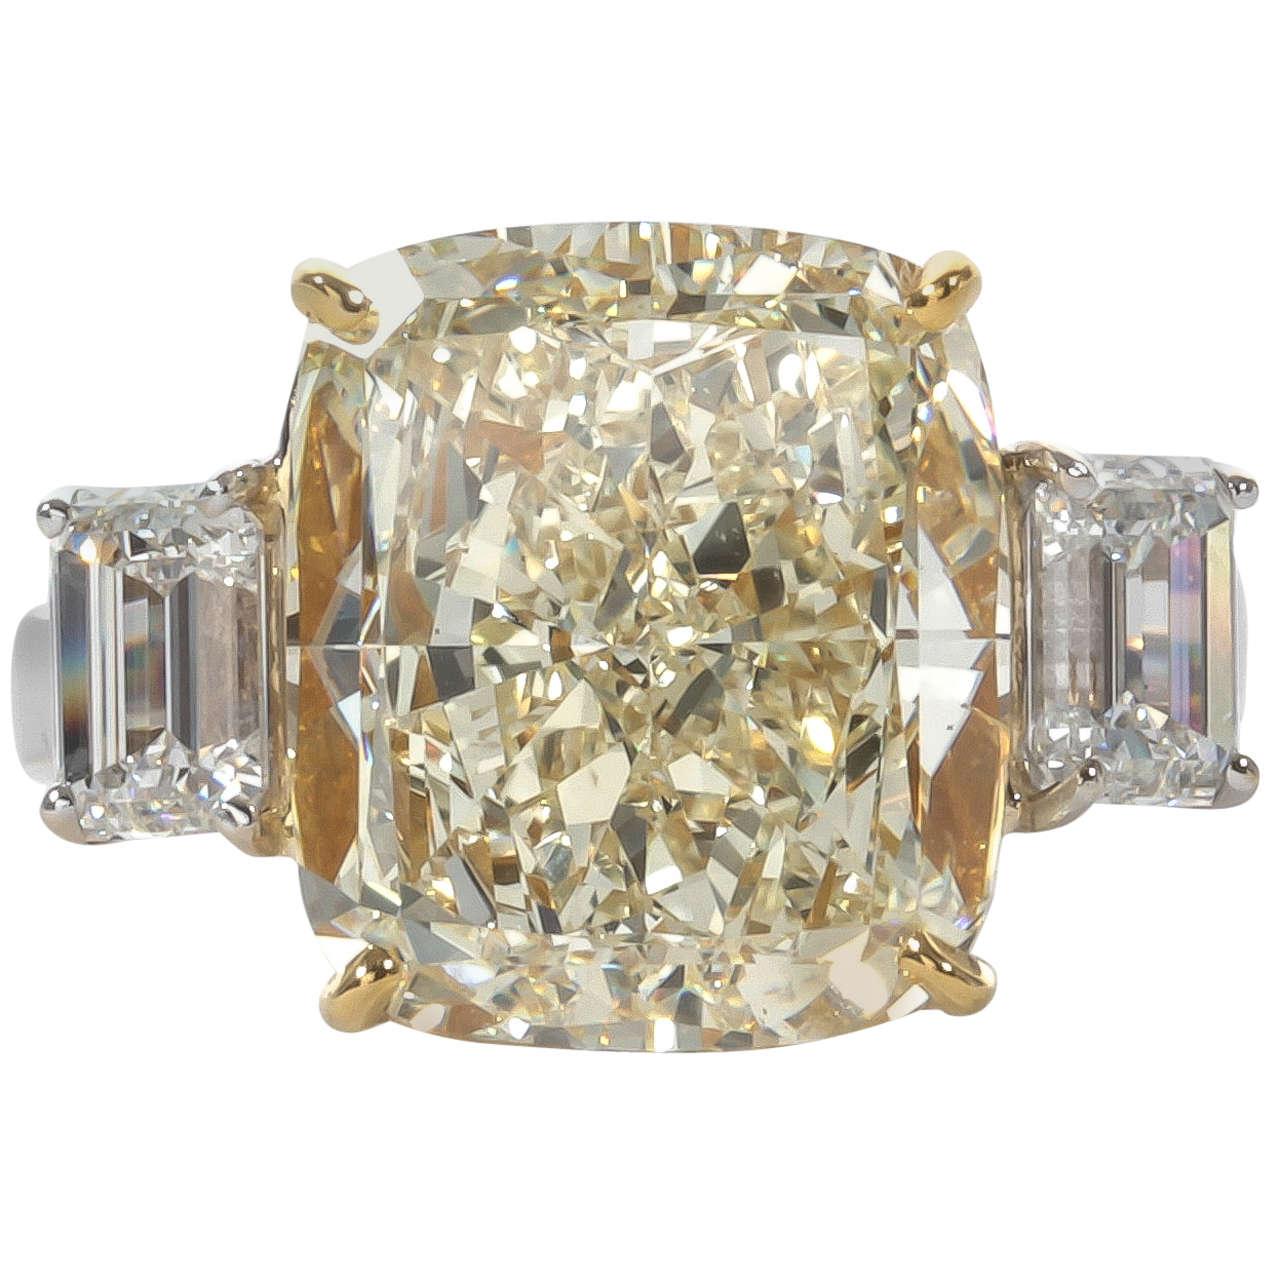 Fancy Yellow 10.06 Carat Cushion Cut Diamond Ring